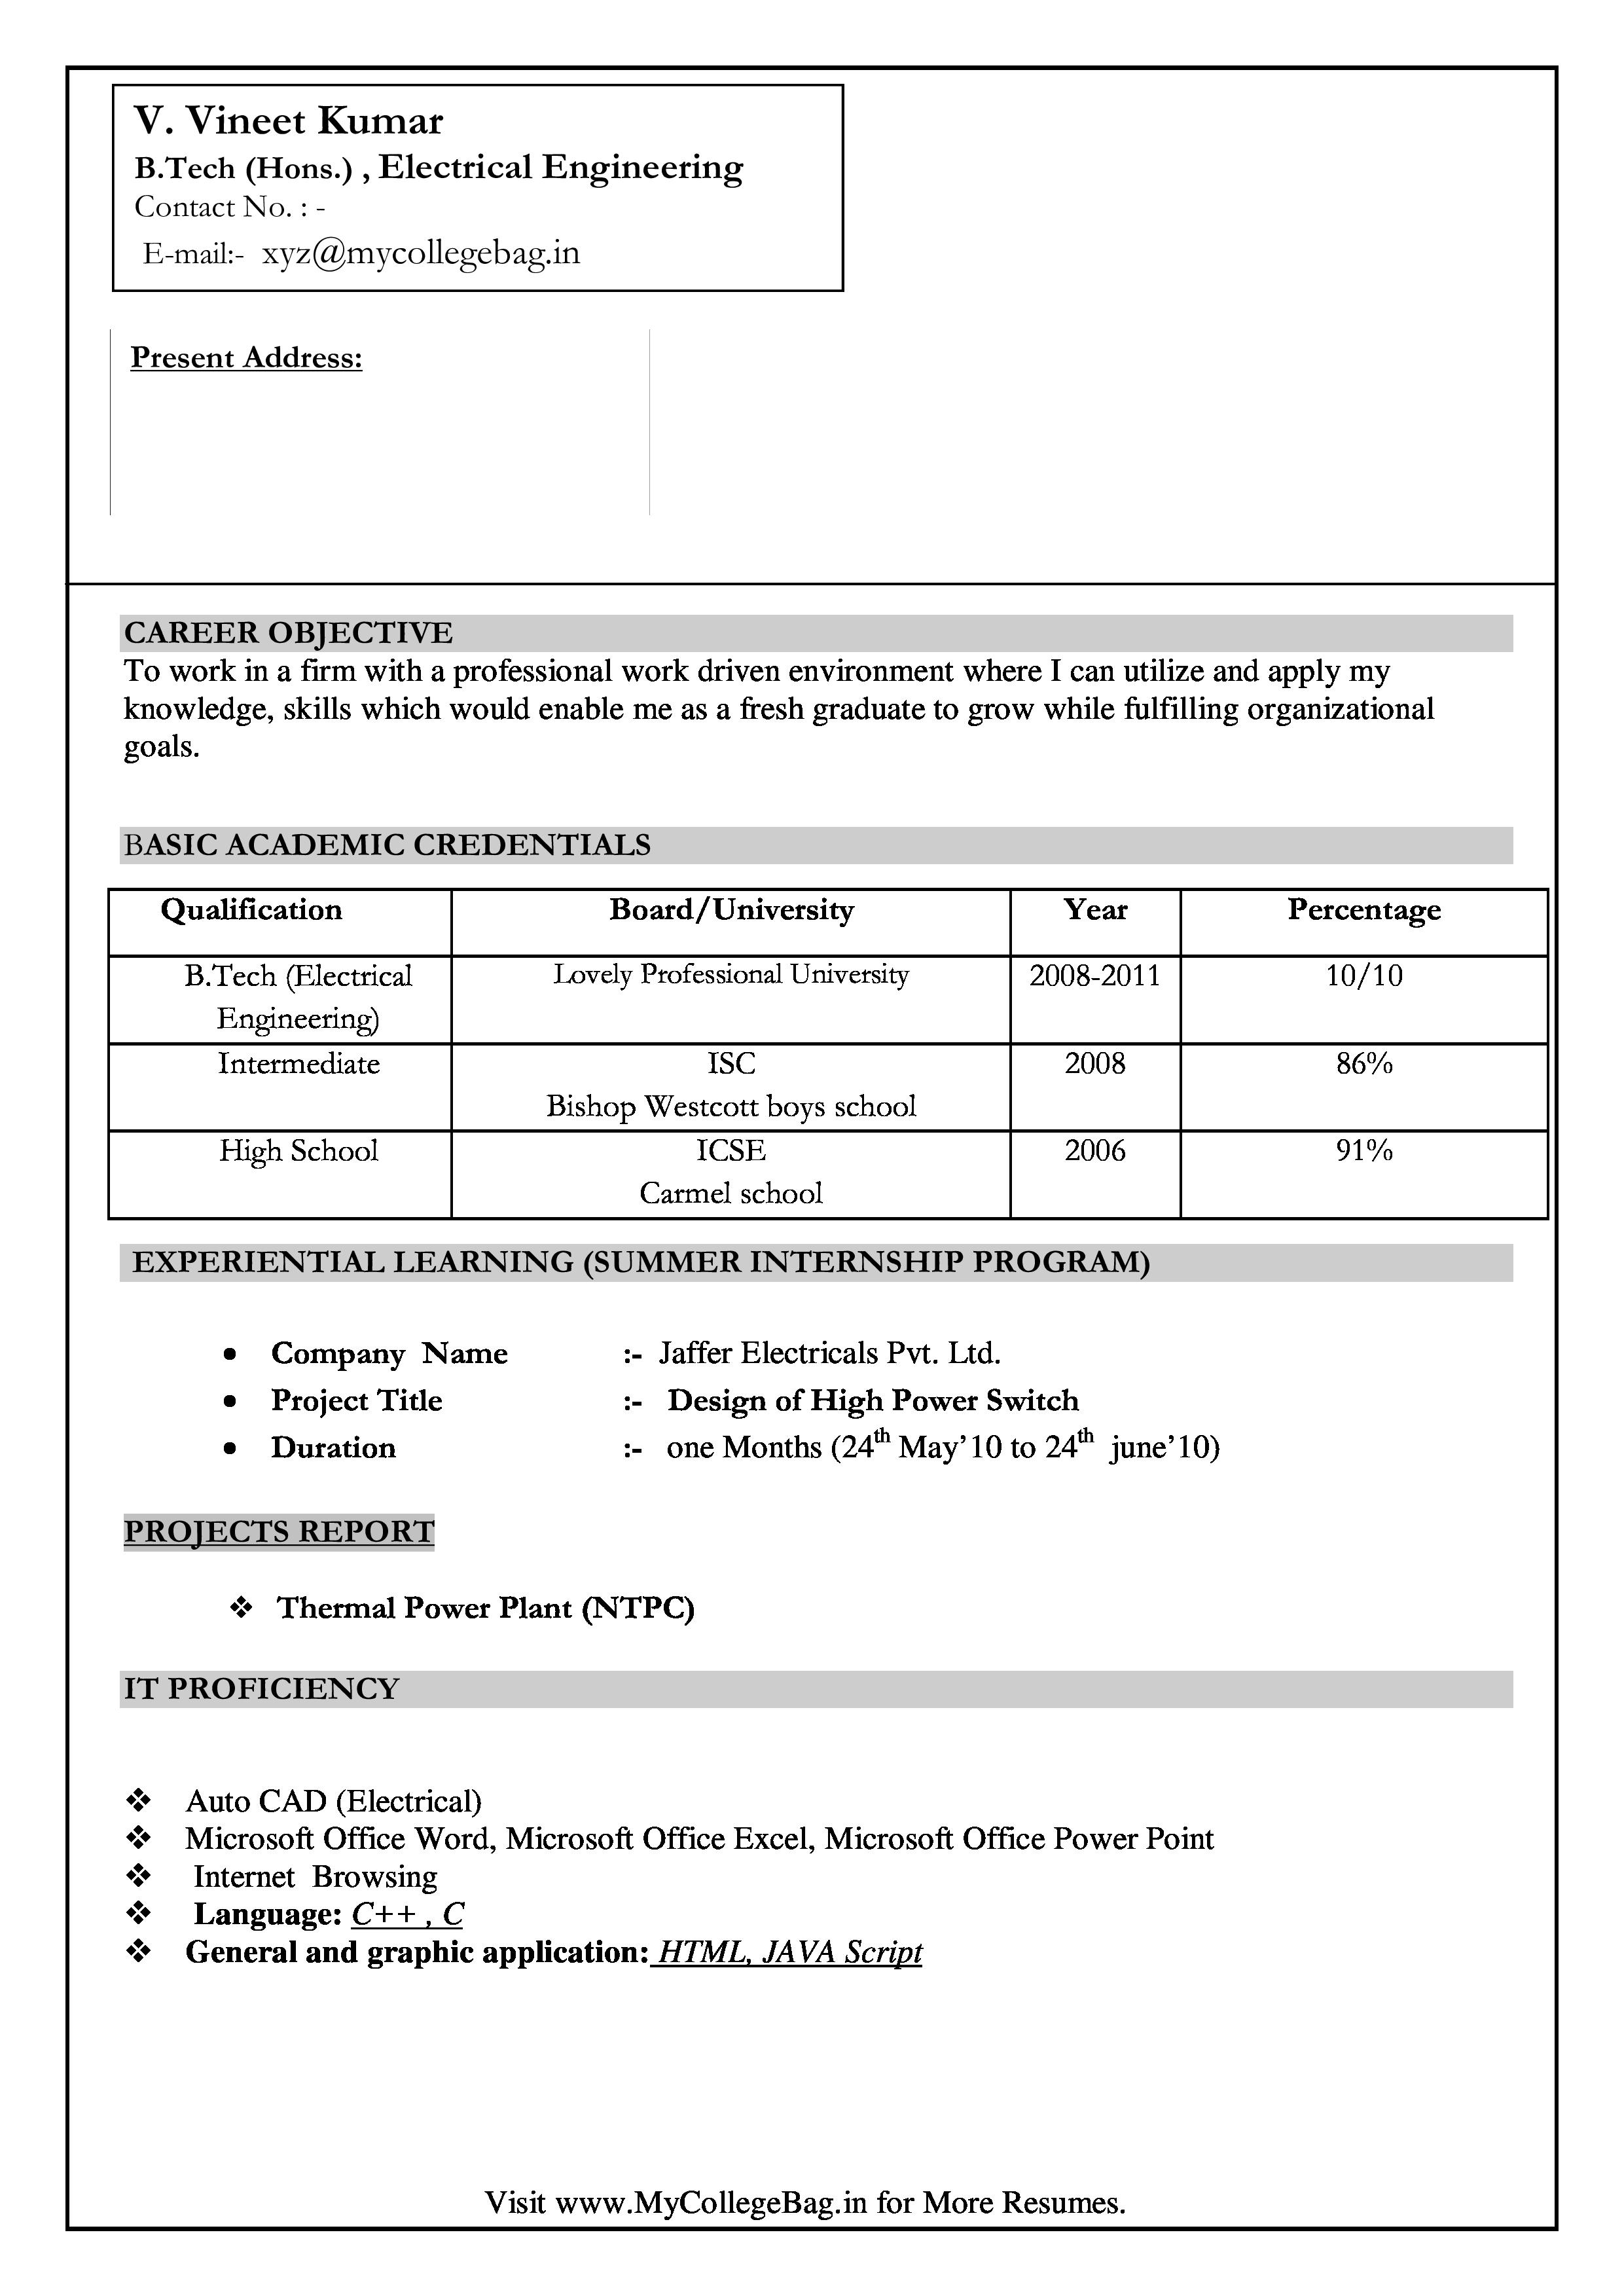 Engineering Fresher Resume Format Download In Ms Word Best